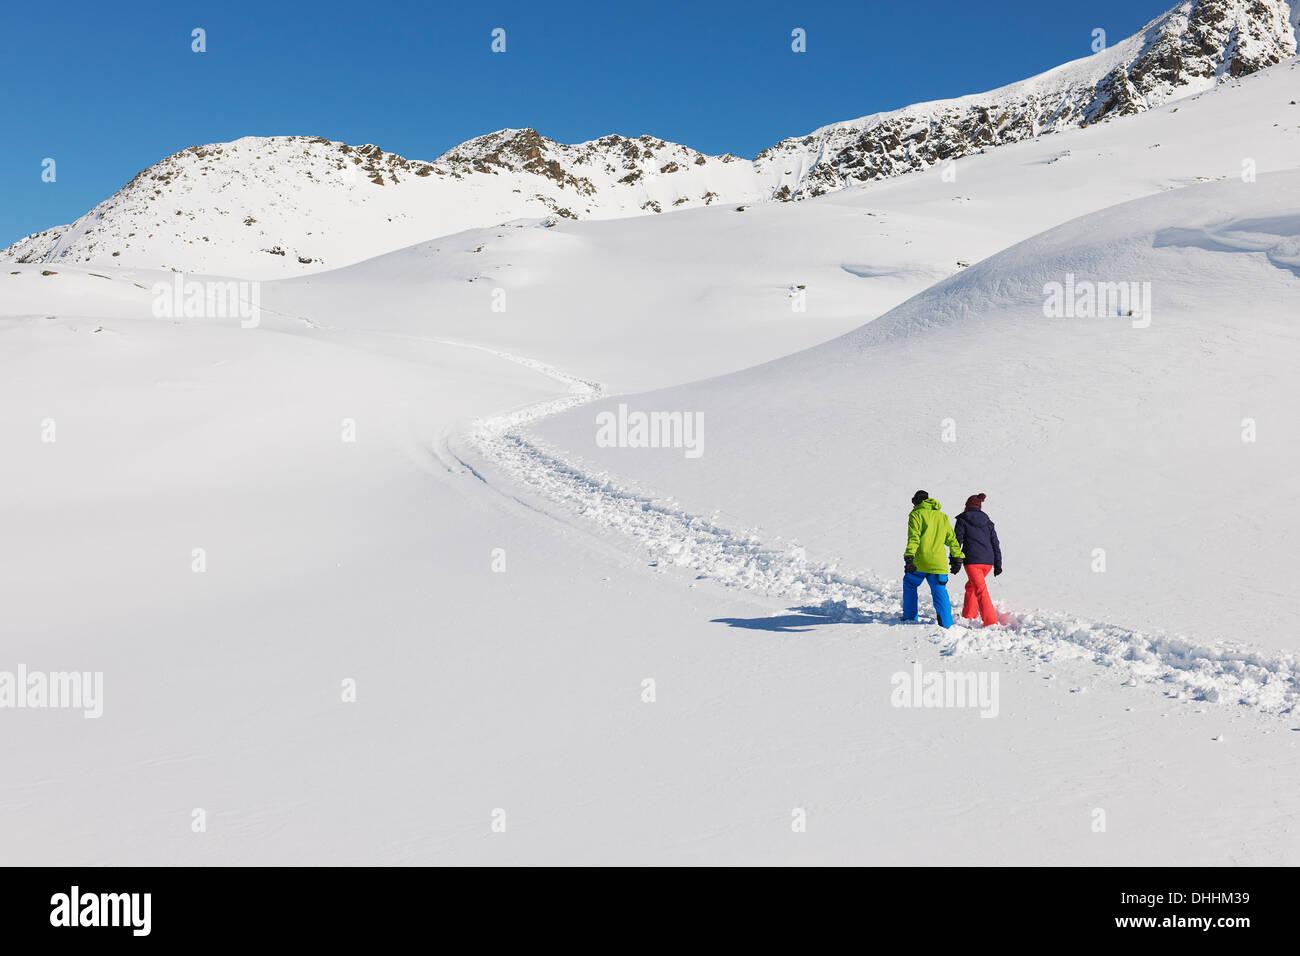 Couple walking in snow, Kuhtai, Austria - Stock Image